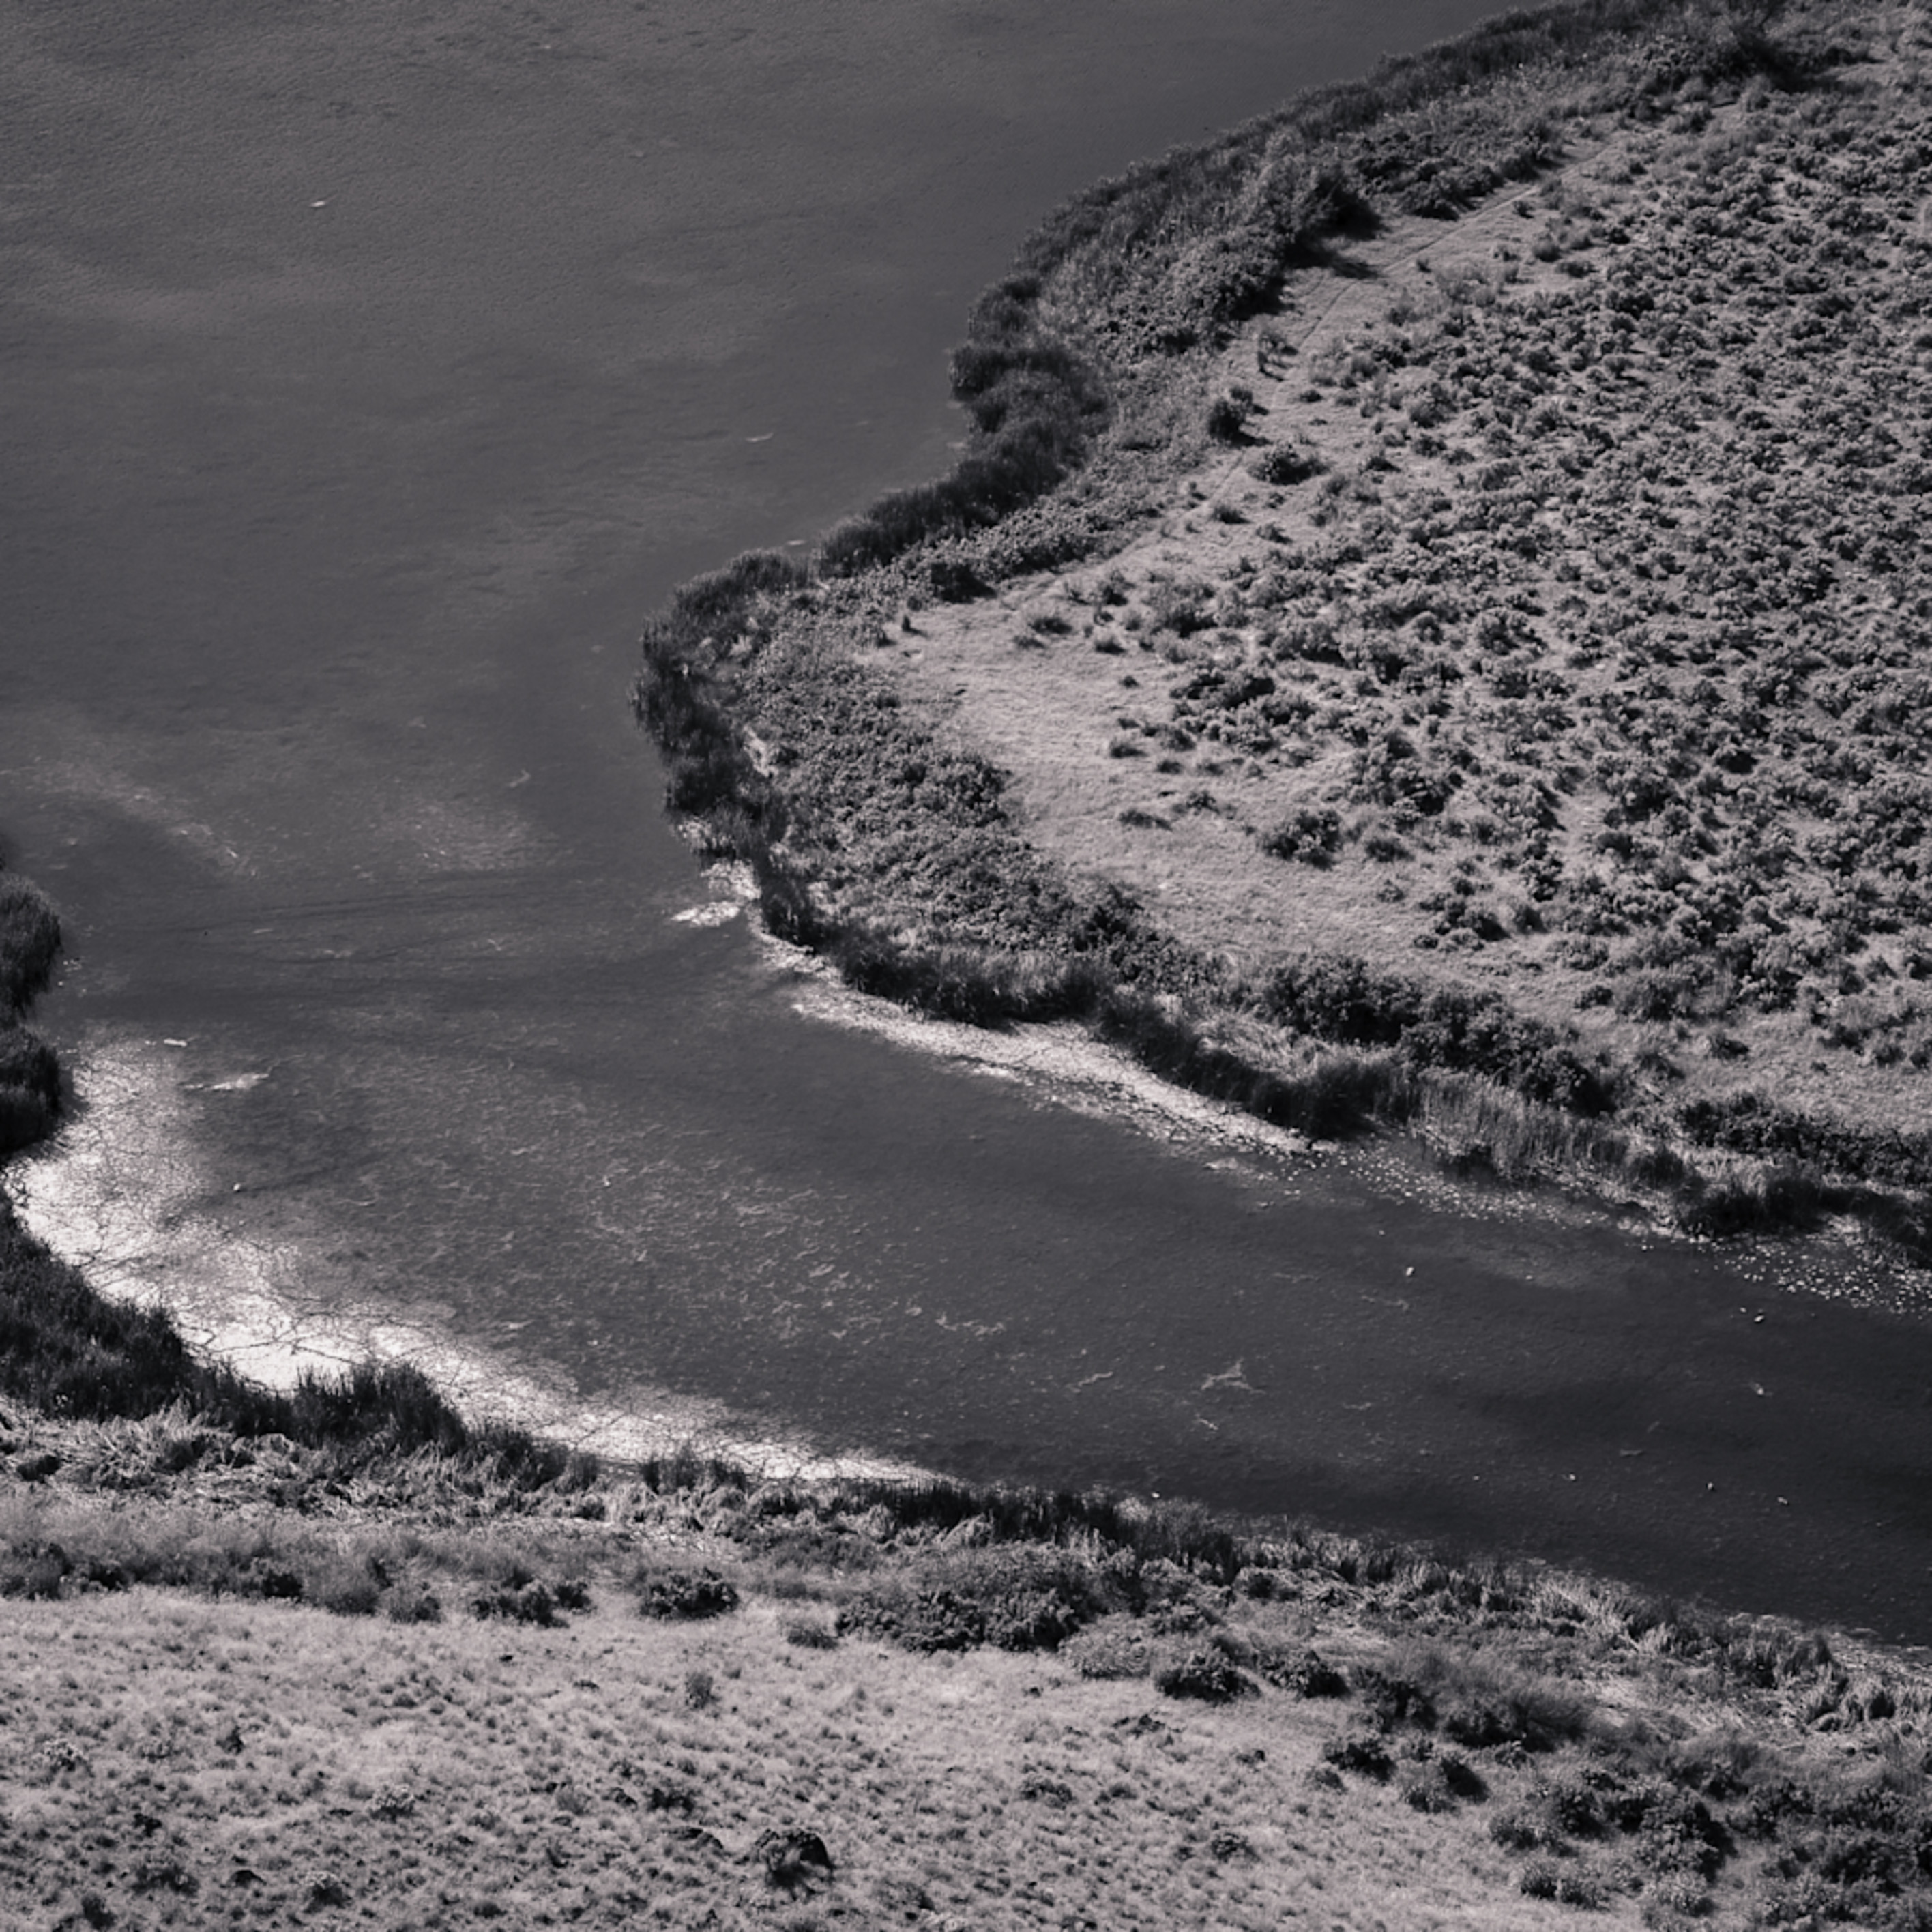 Dry falls lake 1 washington june 2014 yeetkn